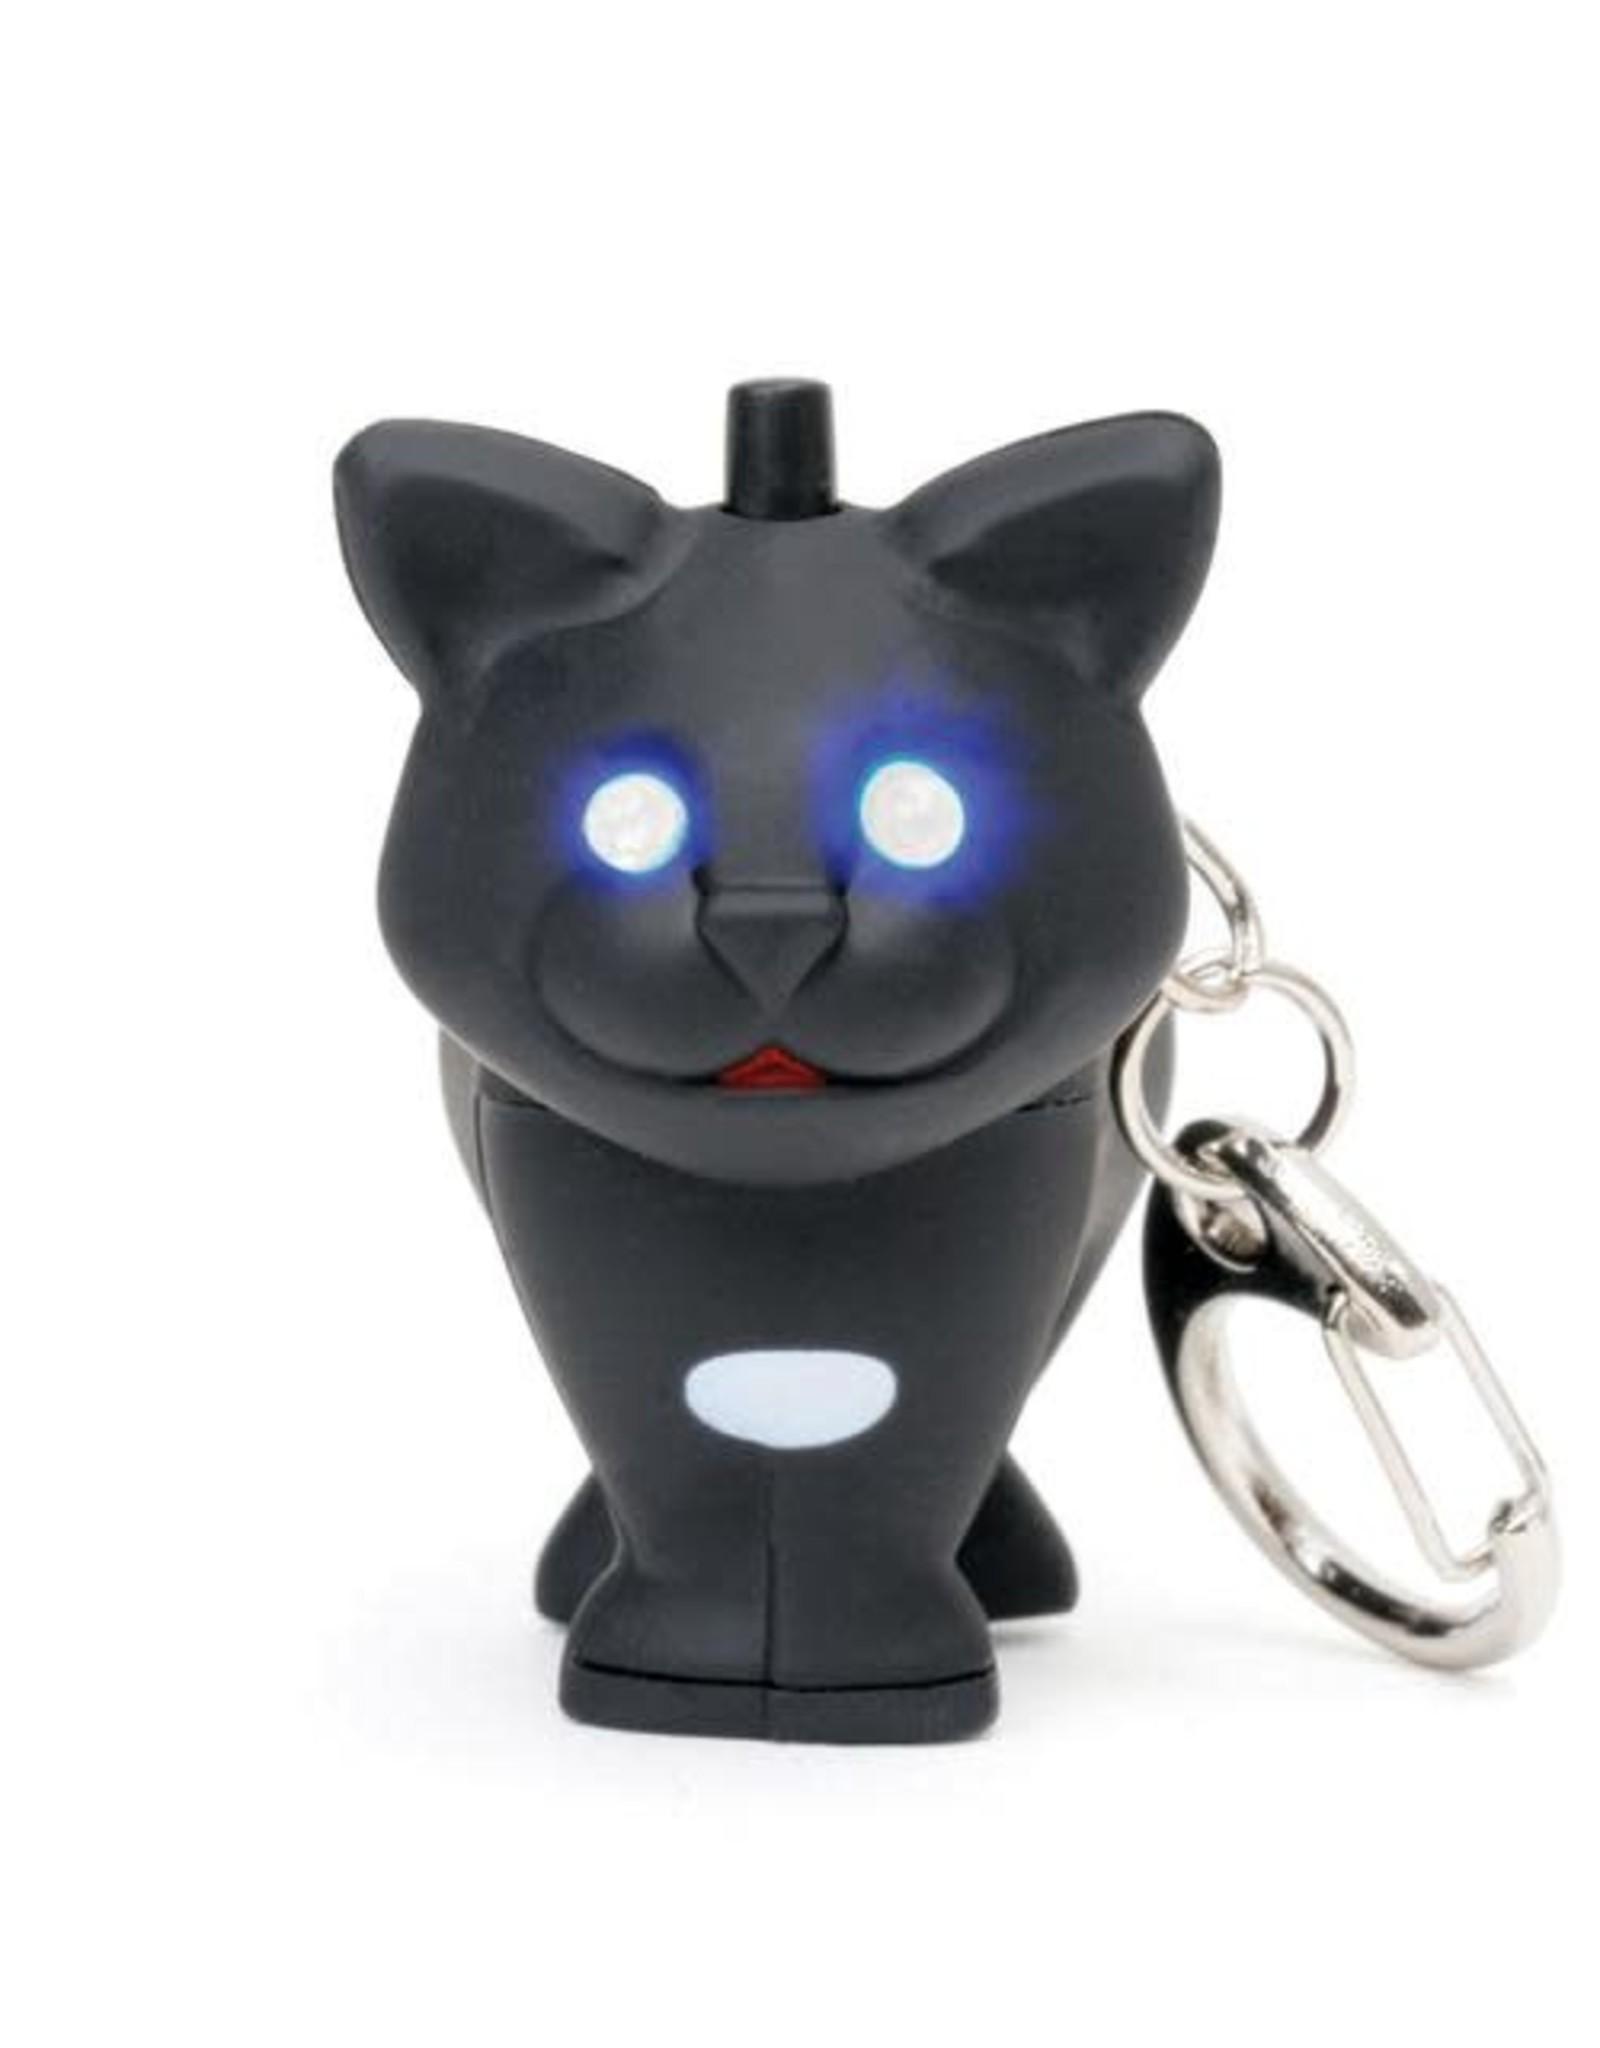 Kikkerland Cat Keychain with LED Light + Sound - Kikkerland